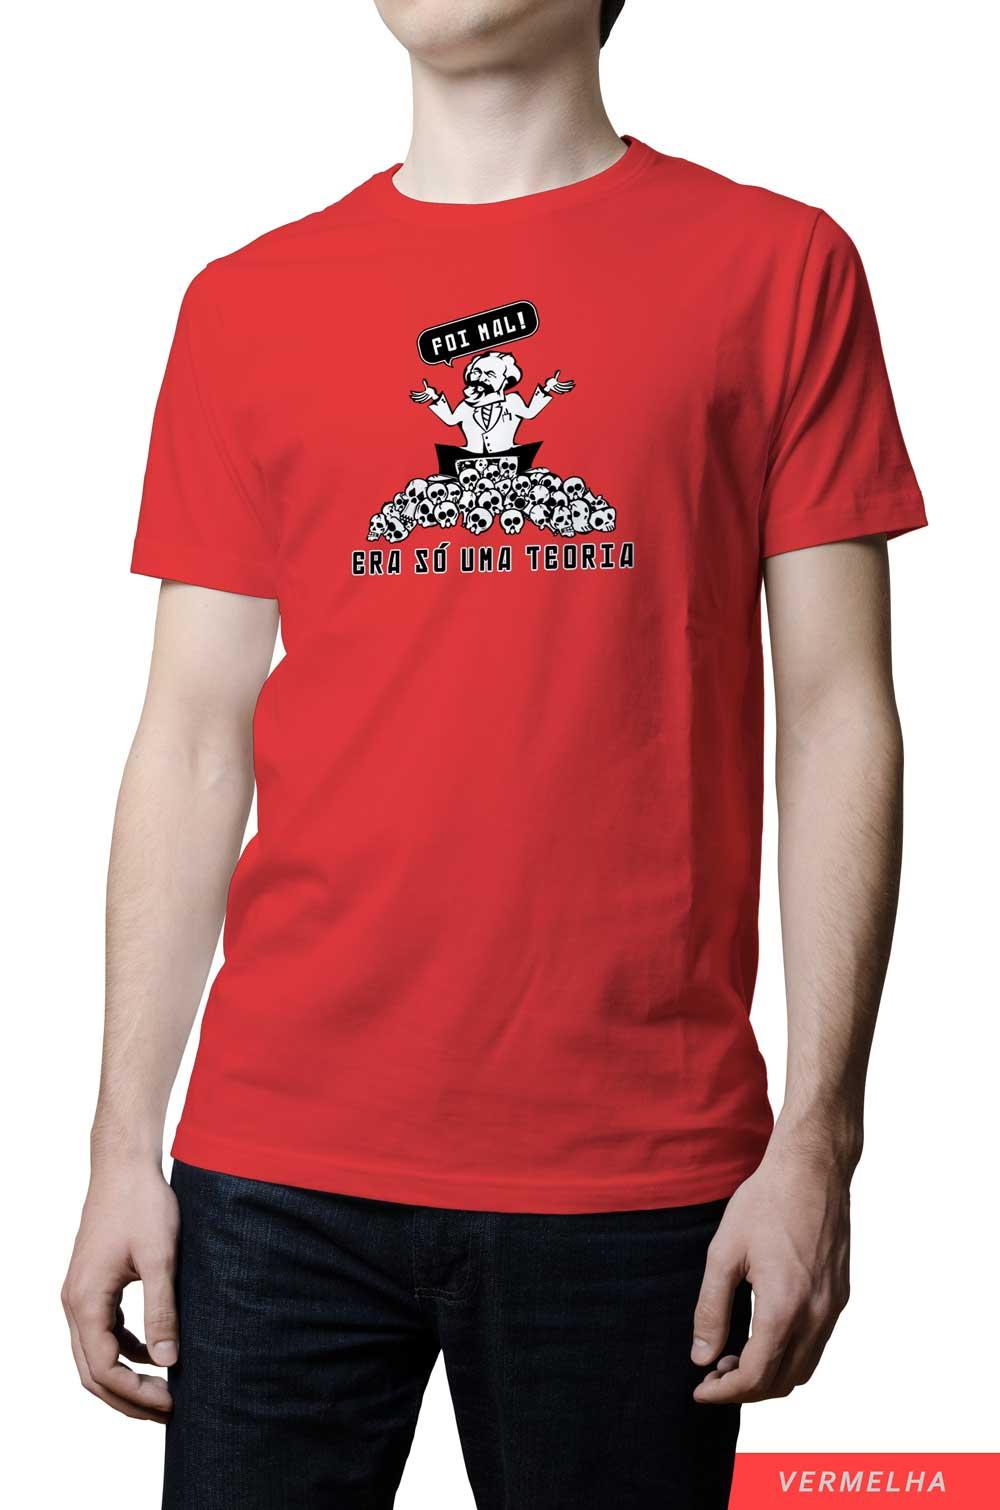 Camiseta - Foi Mal! Era só uma teoria.